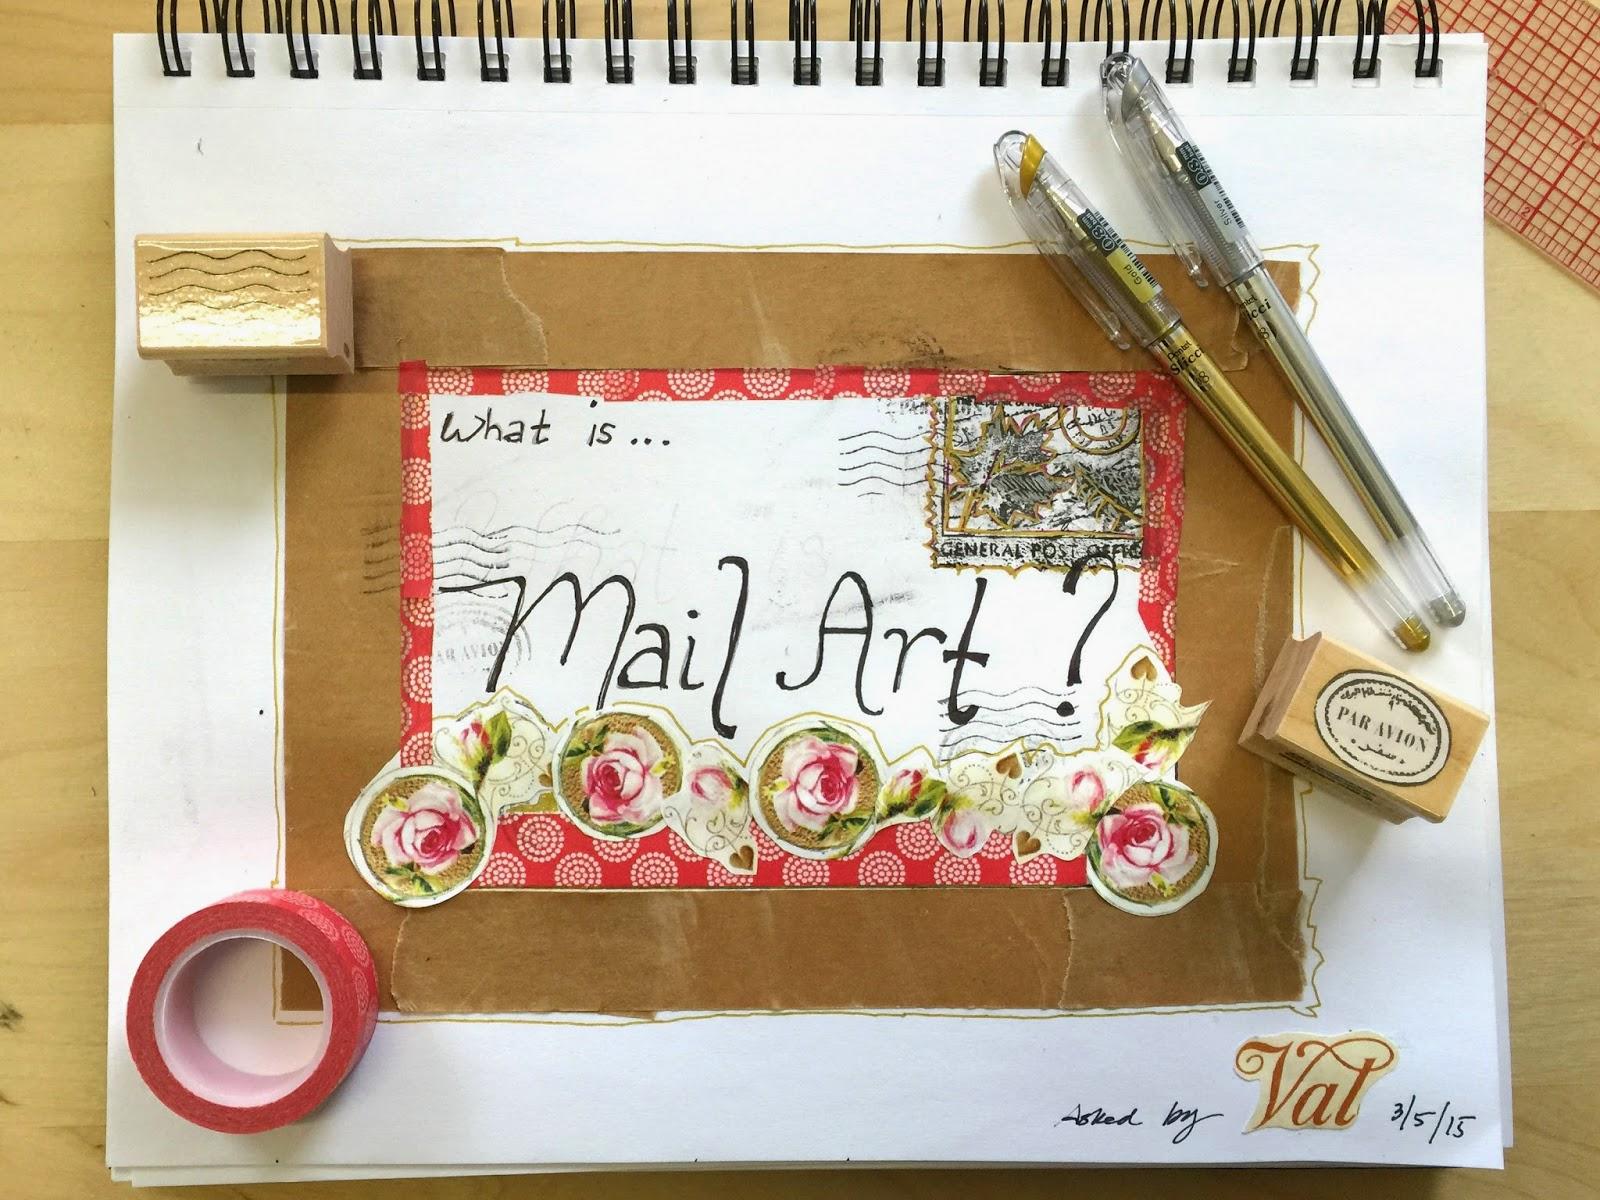 Mail Art?